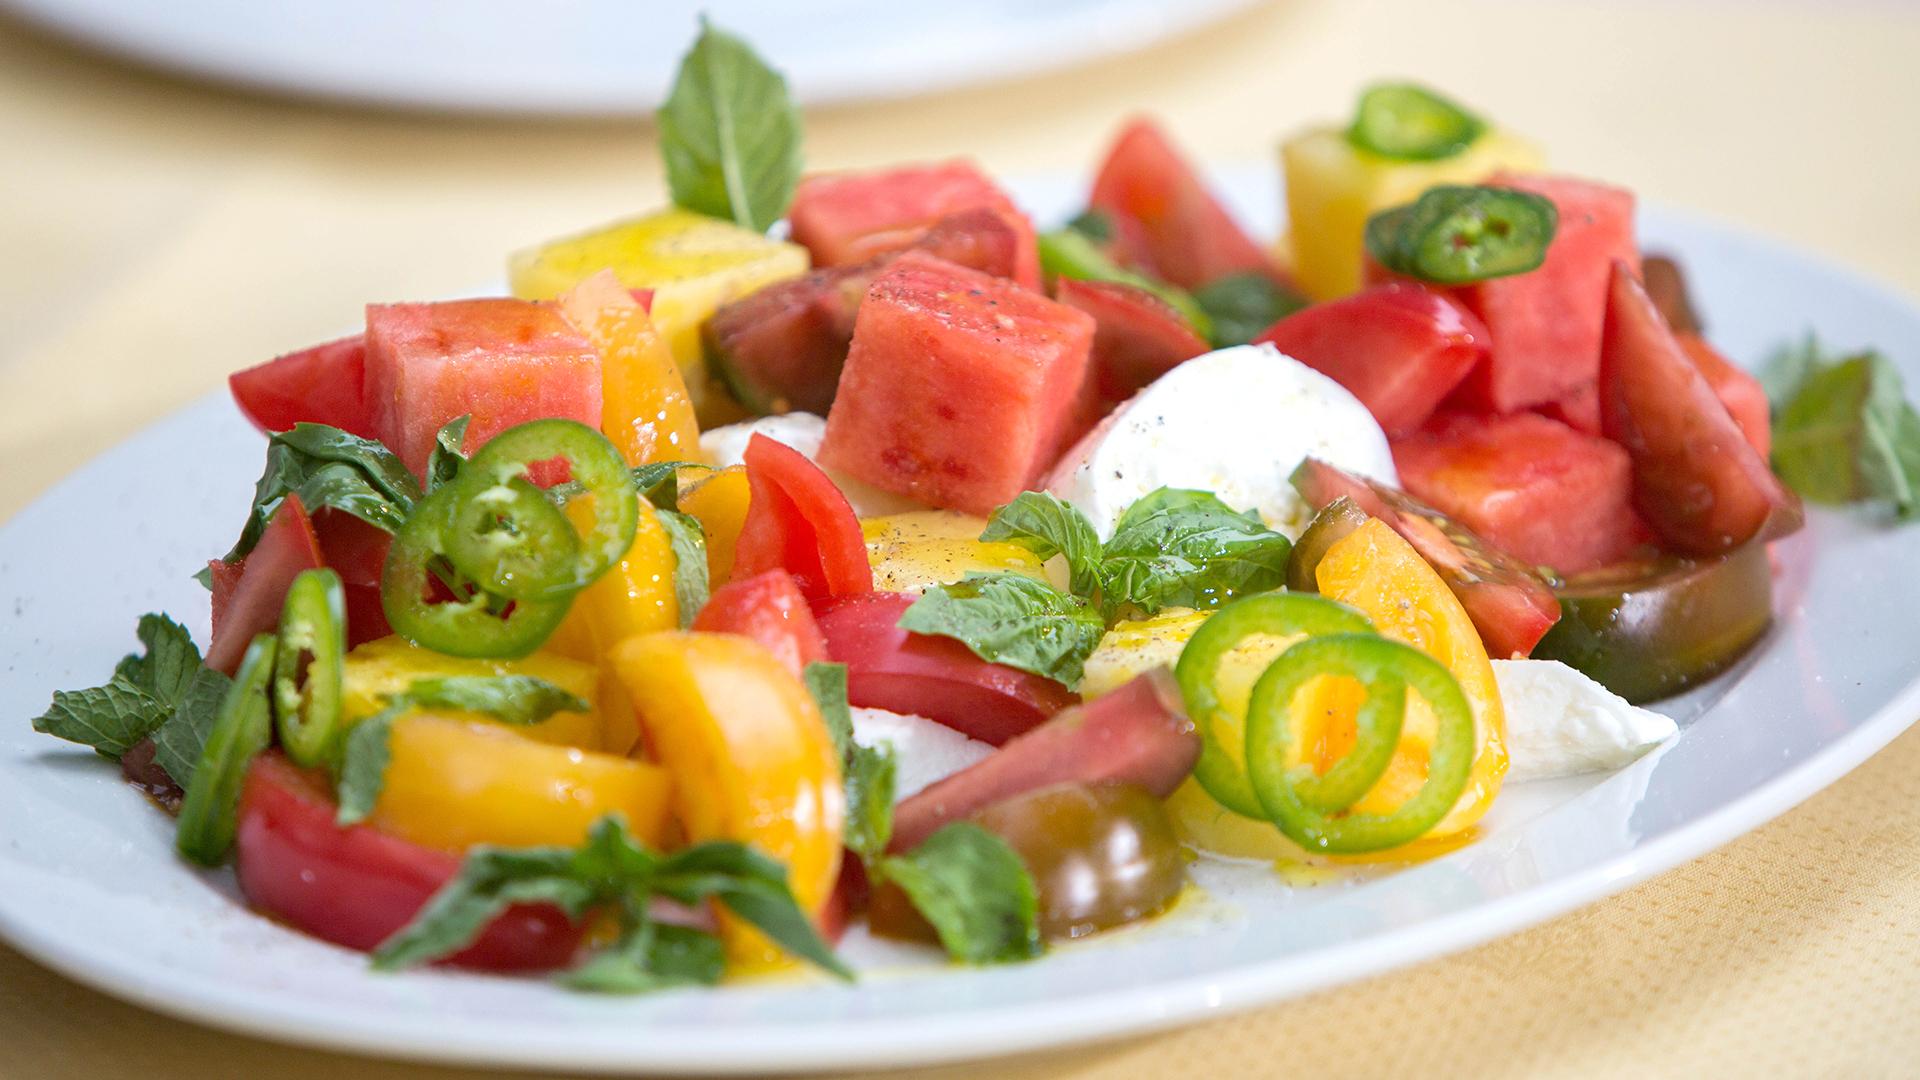 Fullsize Of Heirloom Tomato Salad